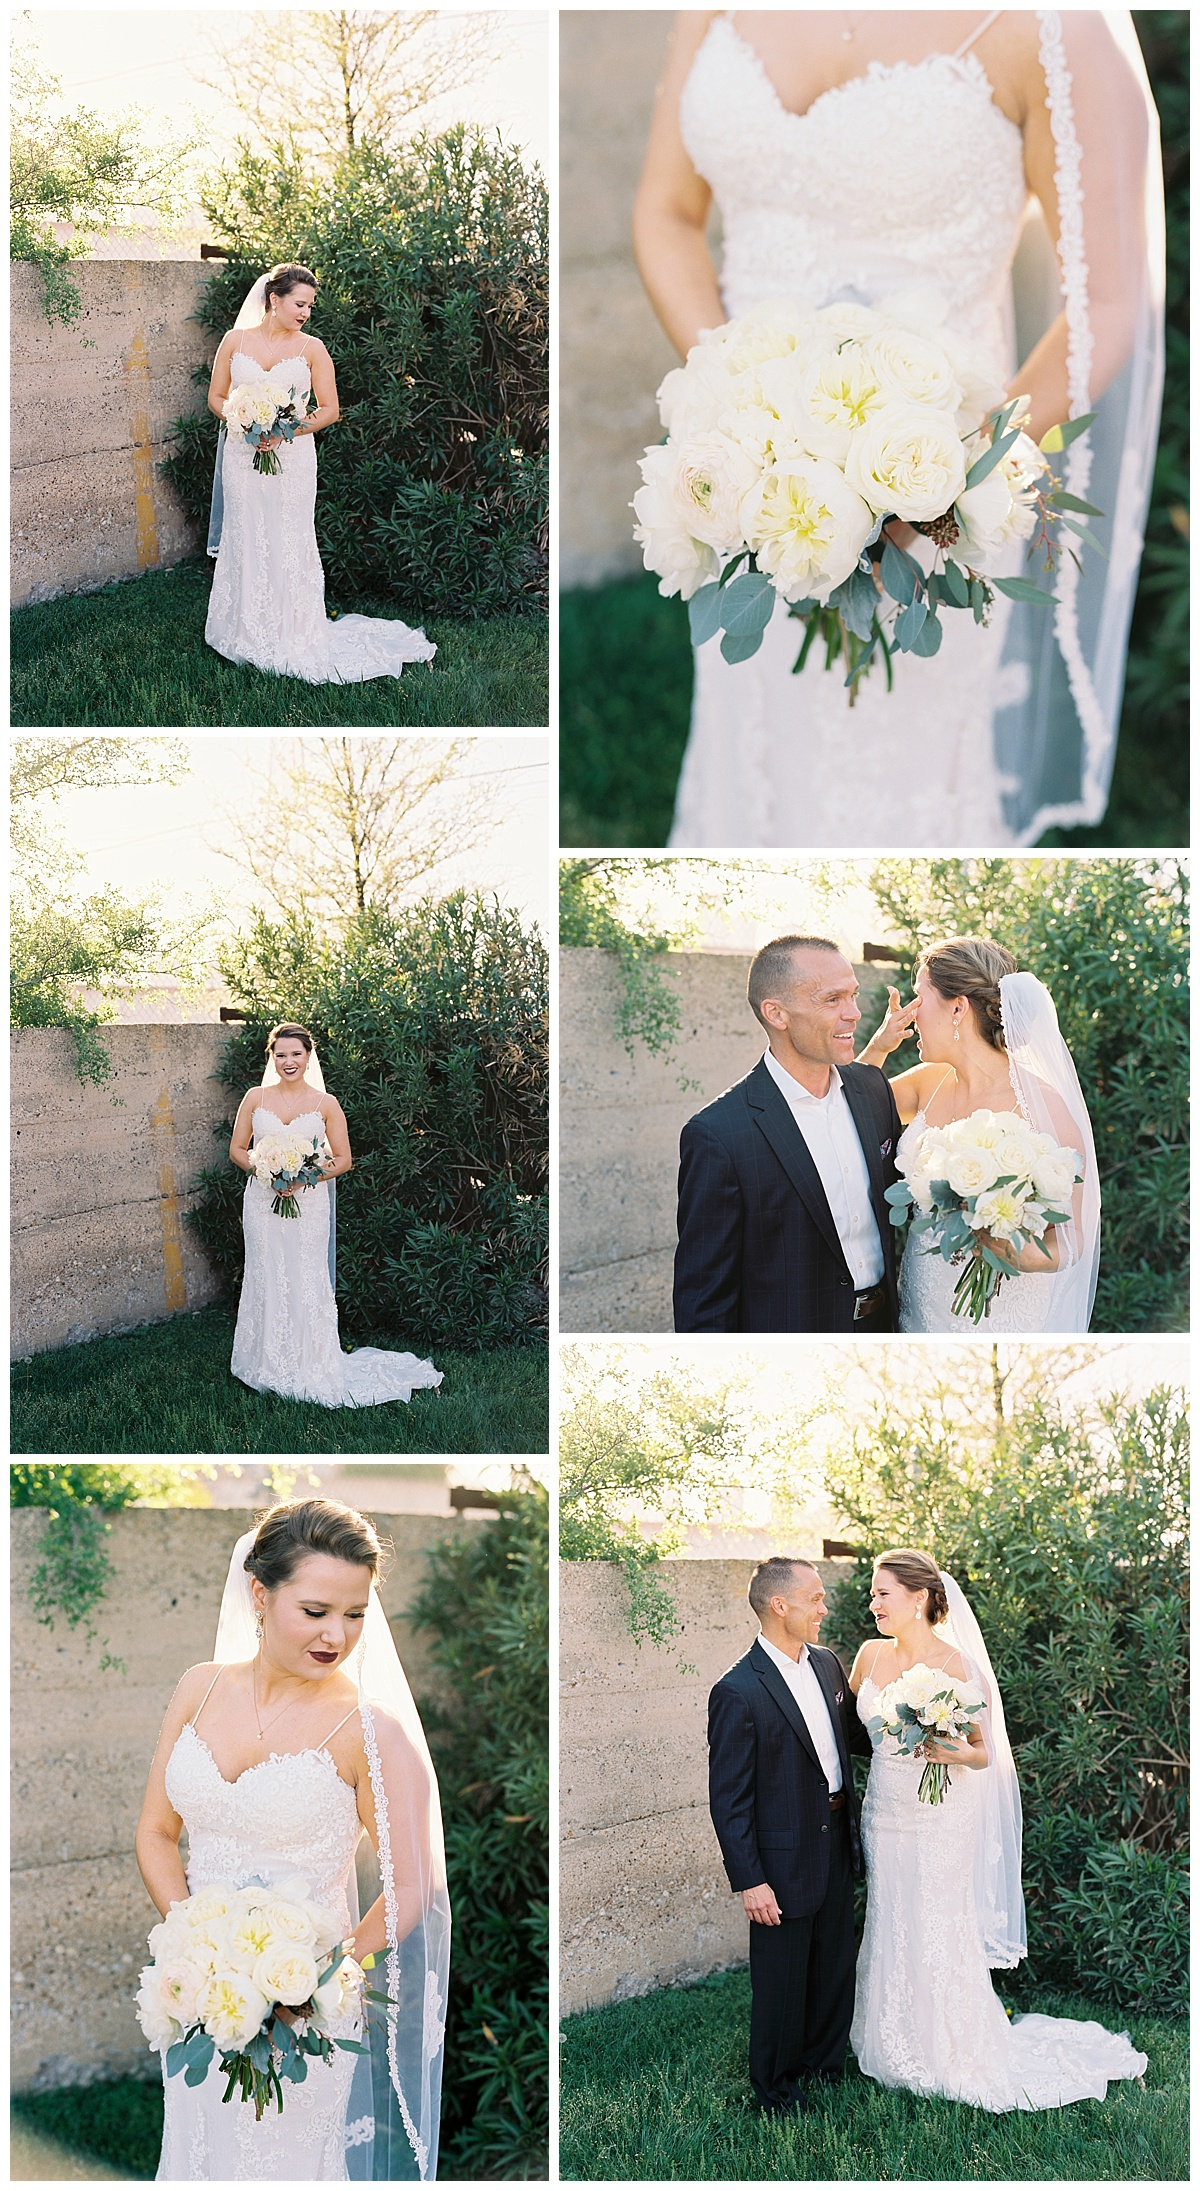 hickory-stree-annex-wedding-ar-photography-nicole-nolan-8.jpg